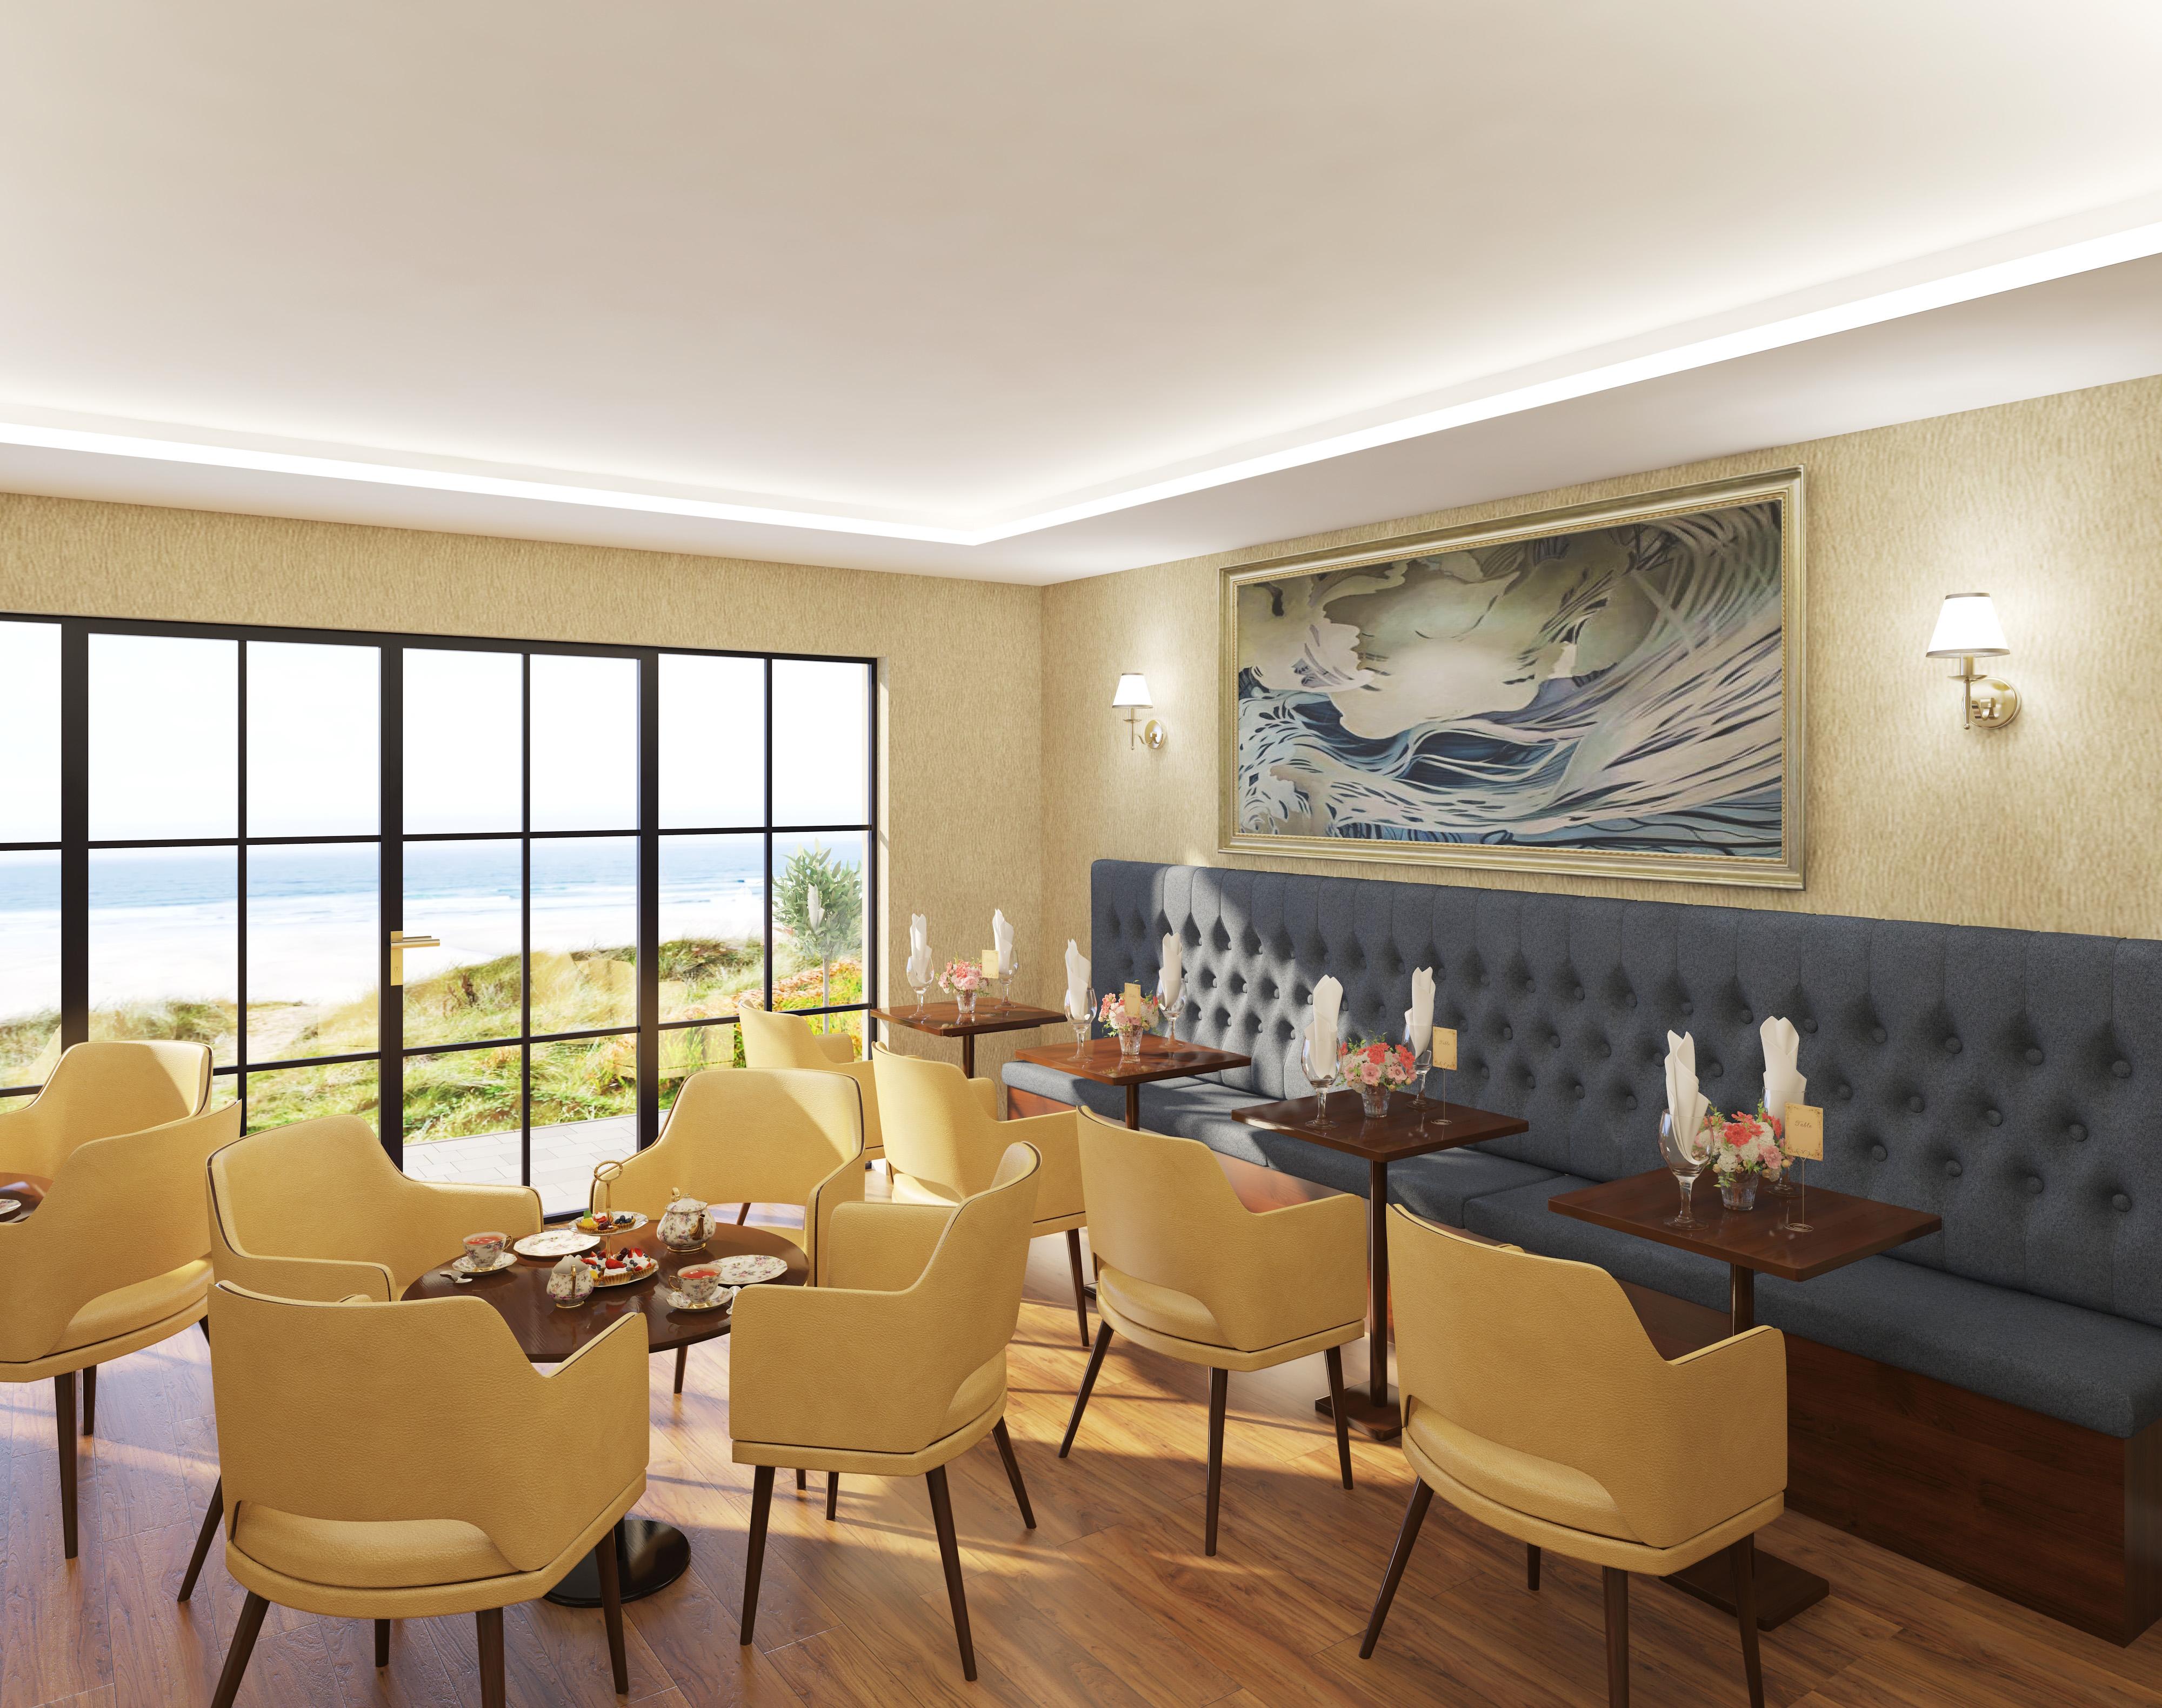 Dementia Friendly Dining Room